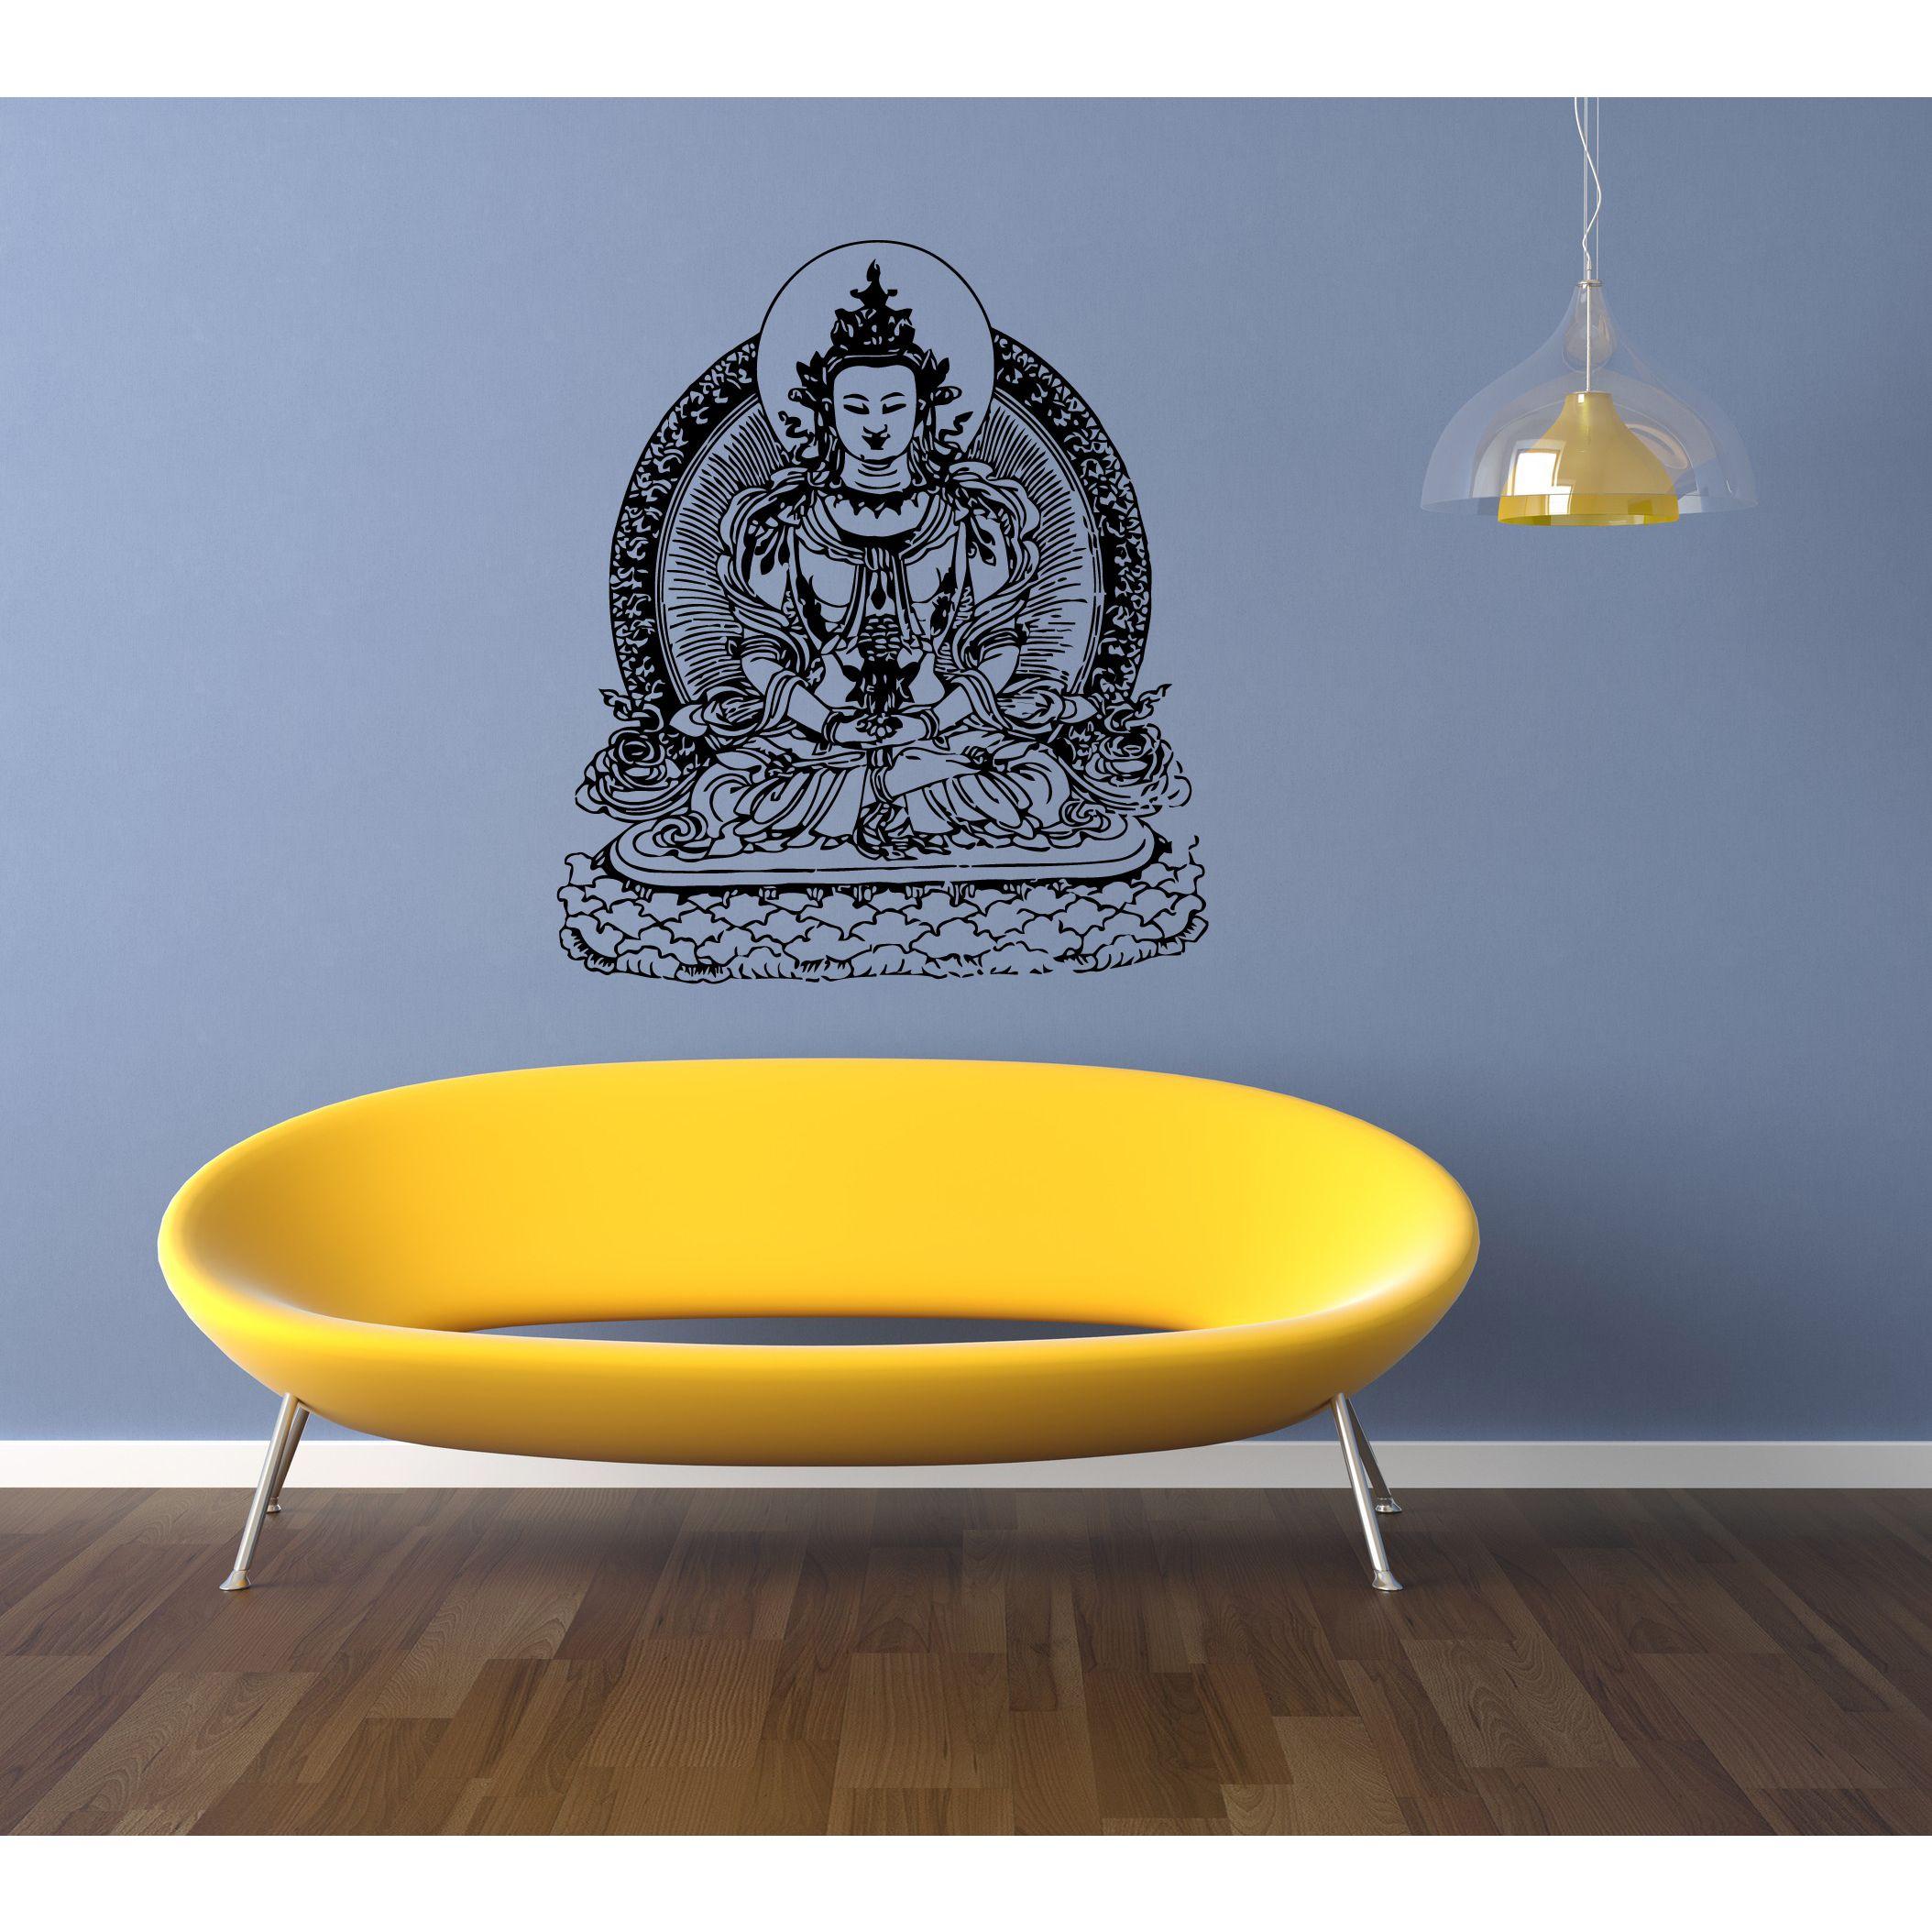 Gautama Buddha Siddhrtha India Wall Art Sticker Decal | Home decor ...